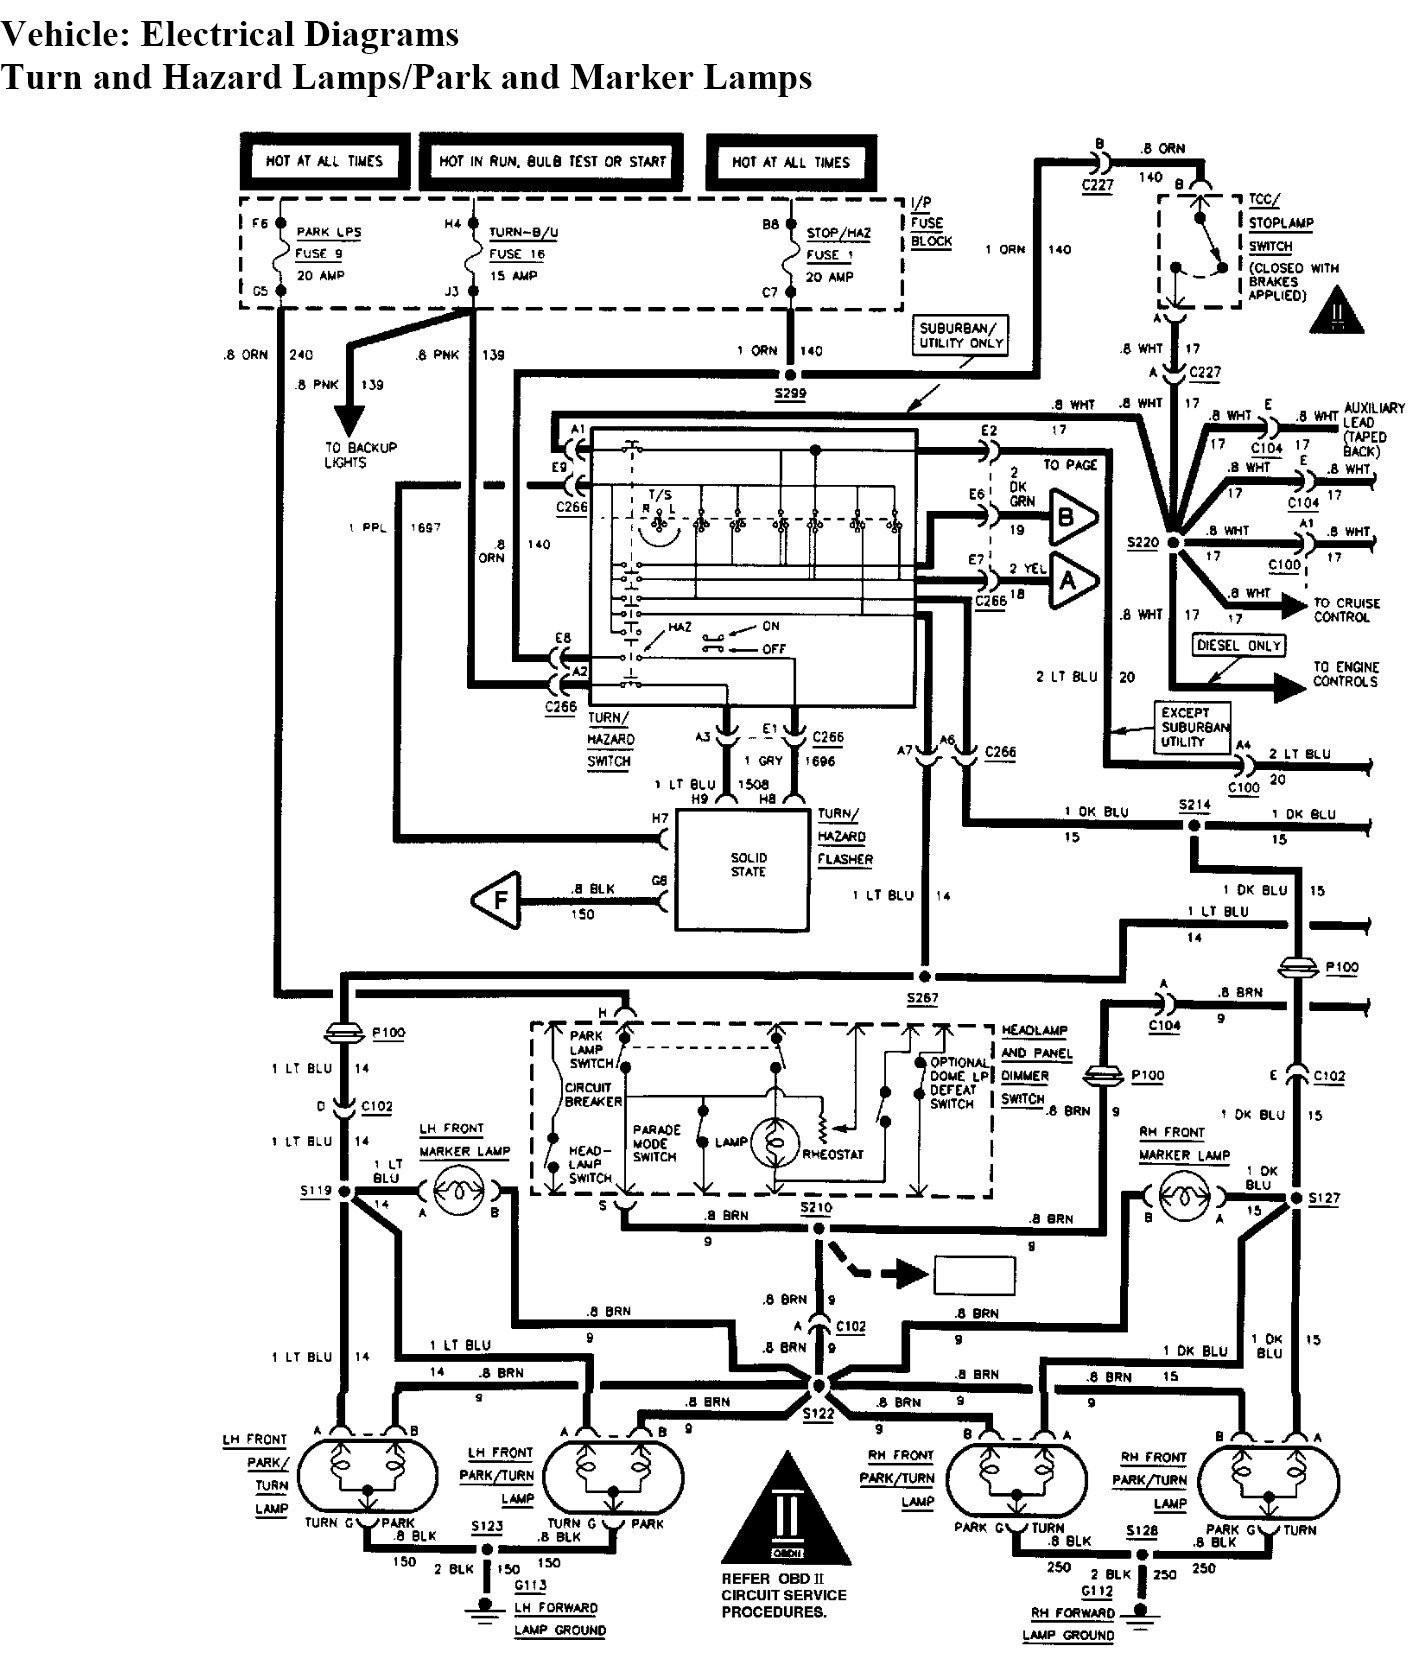 ... 2000 Jeep Grand Cherokee Laredo Parts Diagram - Trusted Schematics Jeep  Grand Cherokee Laredo Wiring Diagram ...